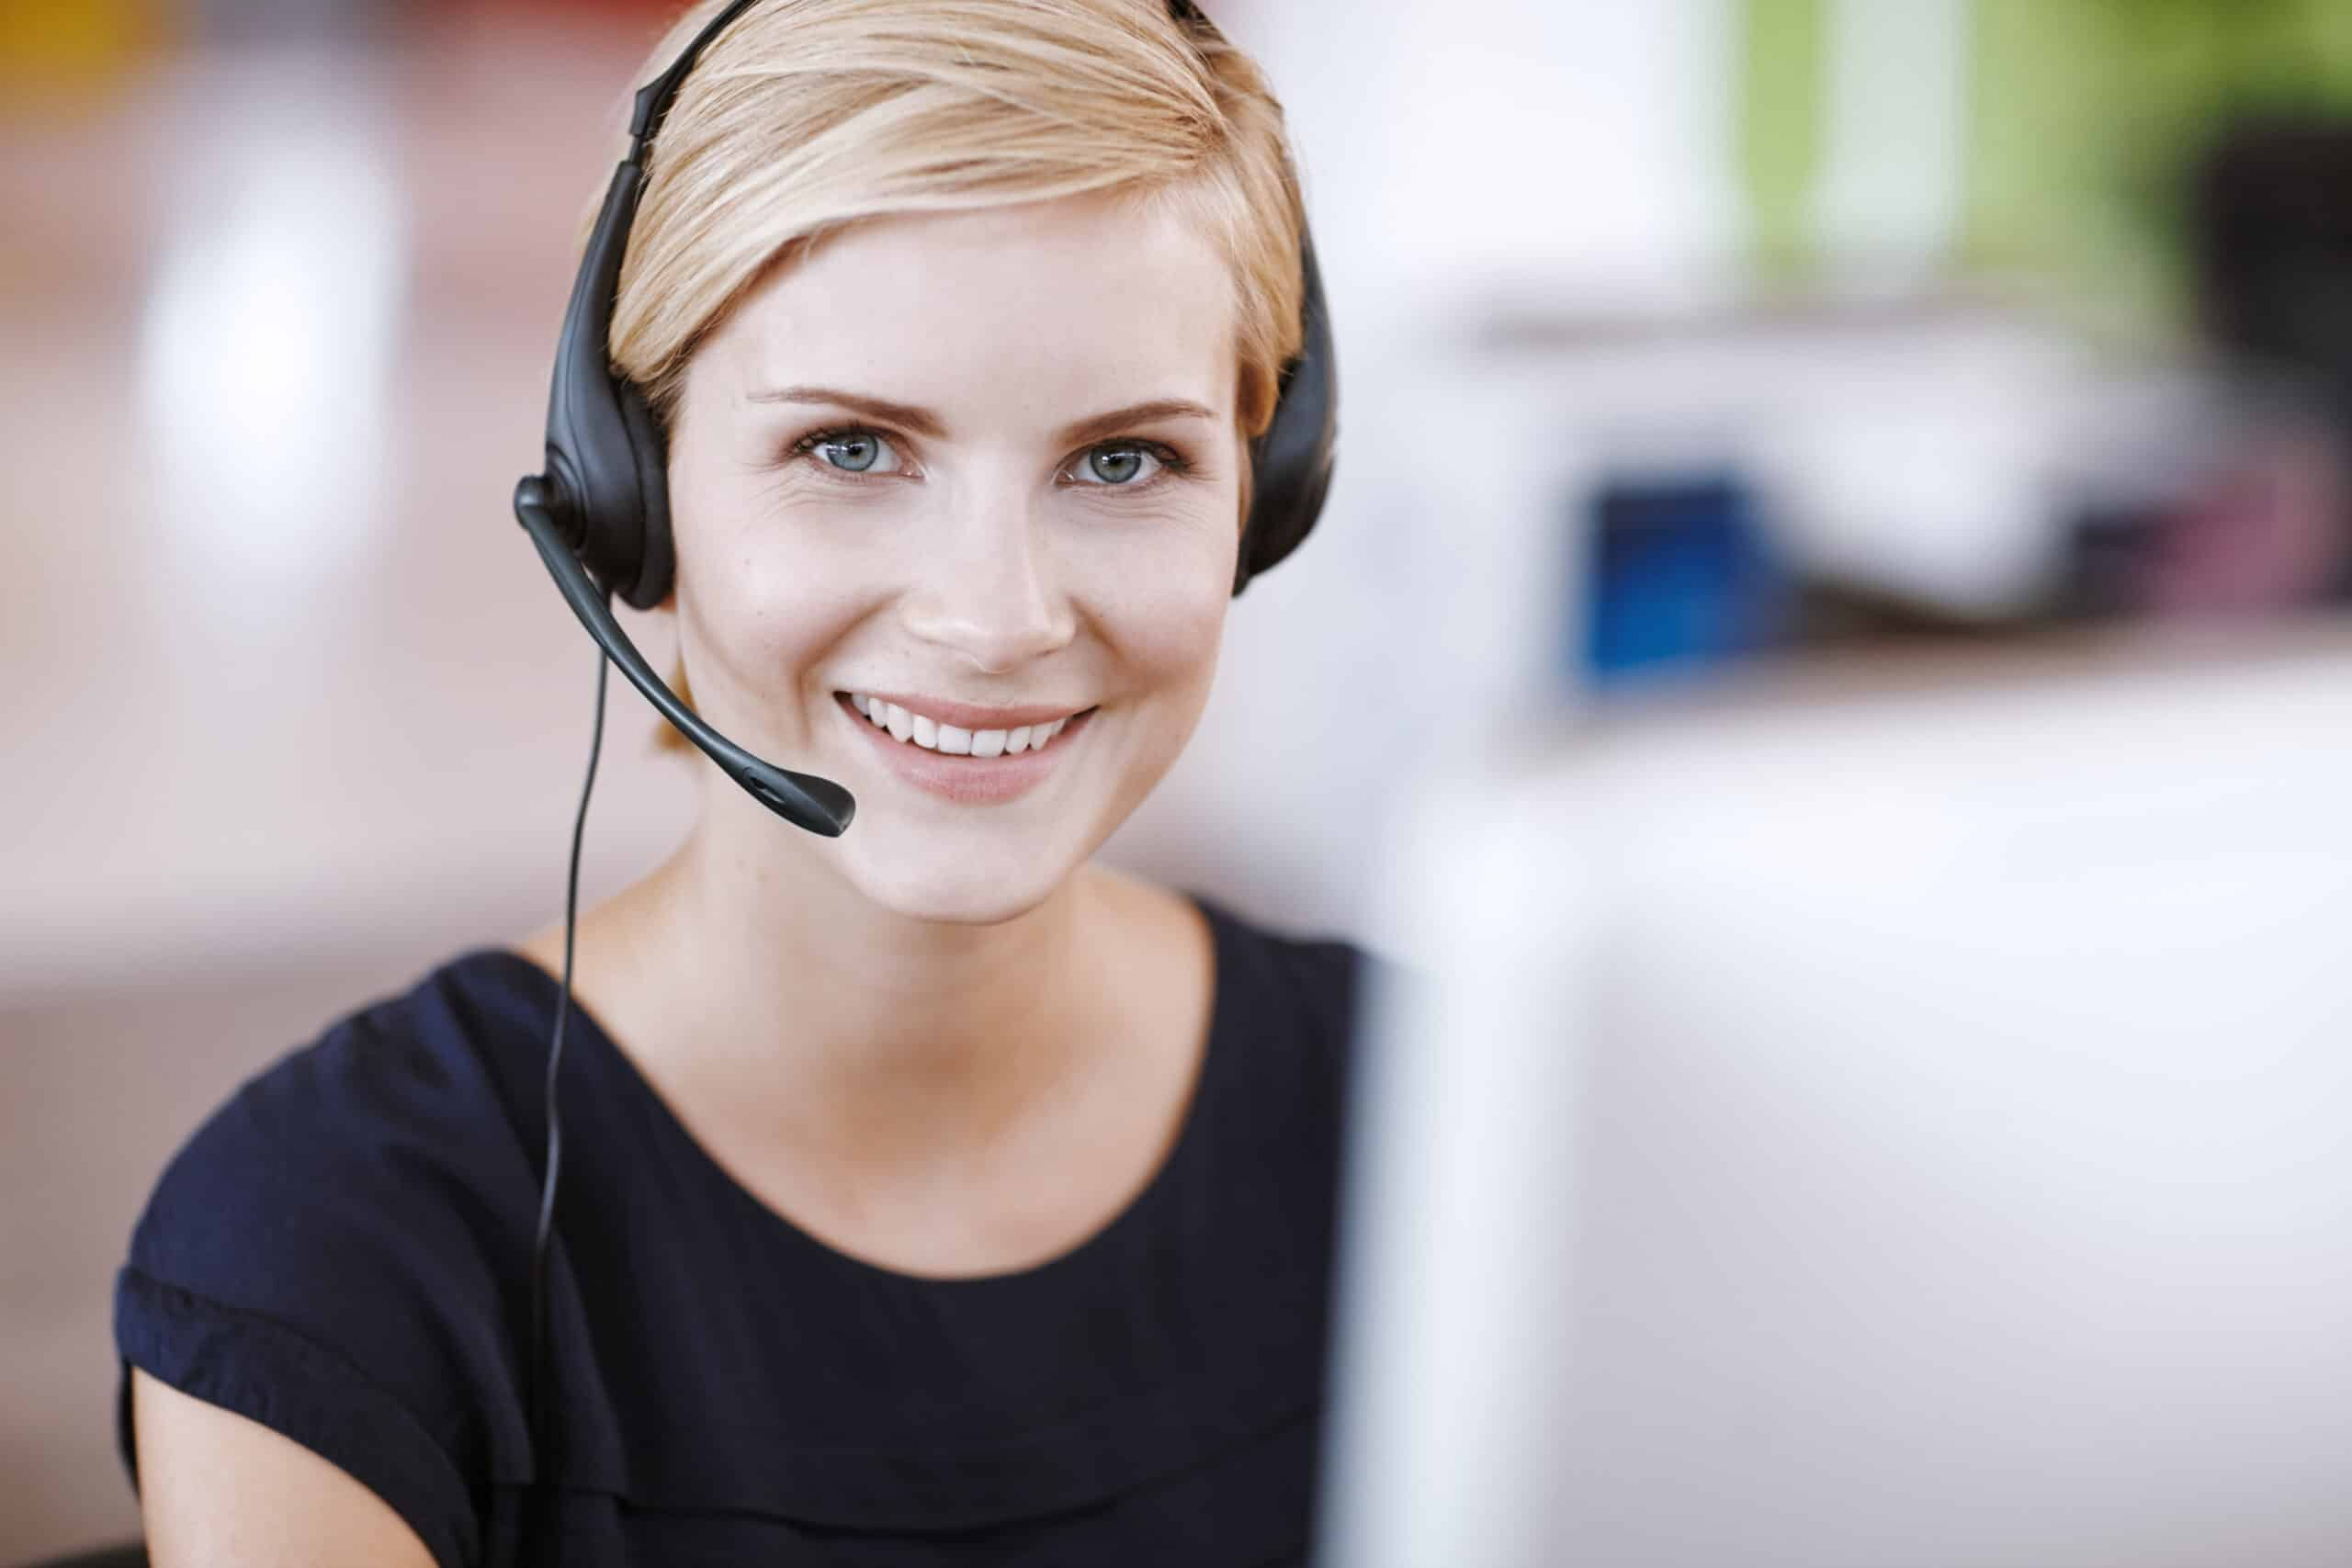 Frau nimmt telefonische Anfrage entgegen